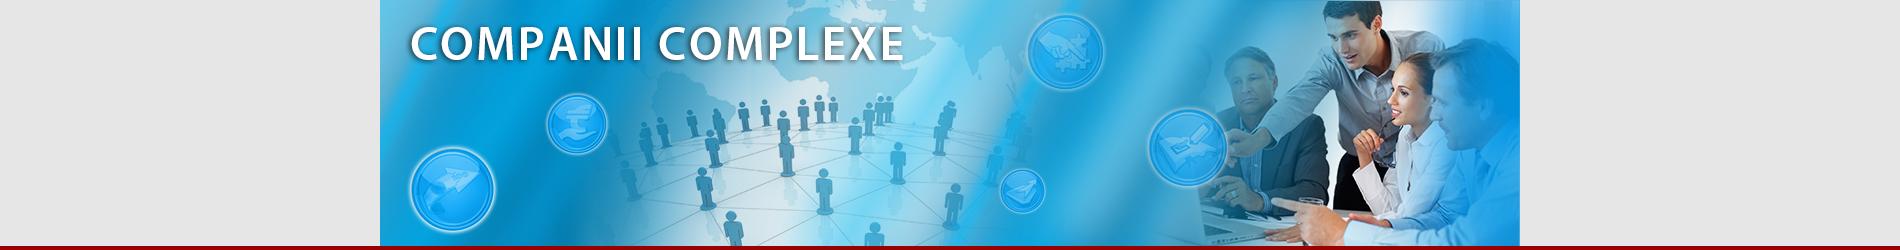 banner_site_companii_complexe